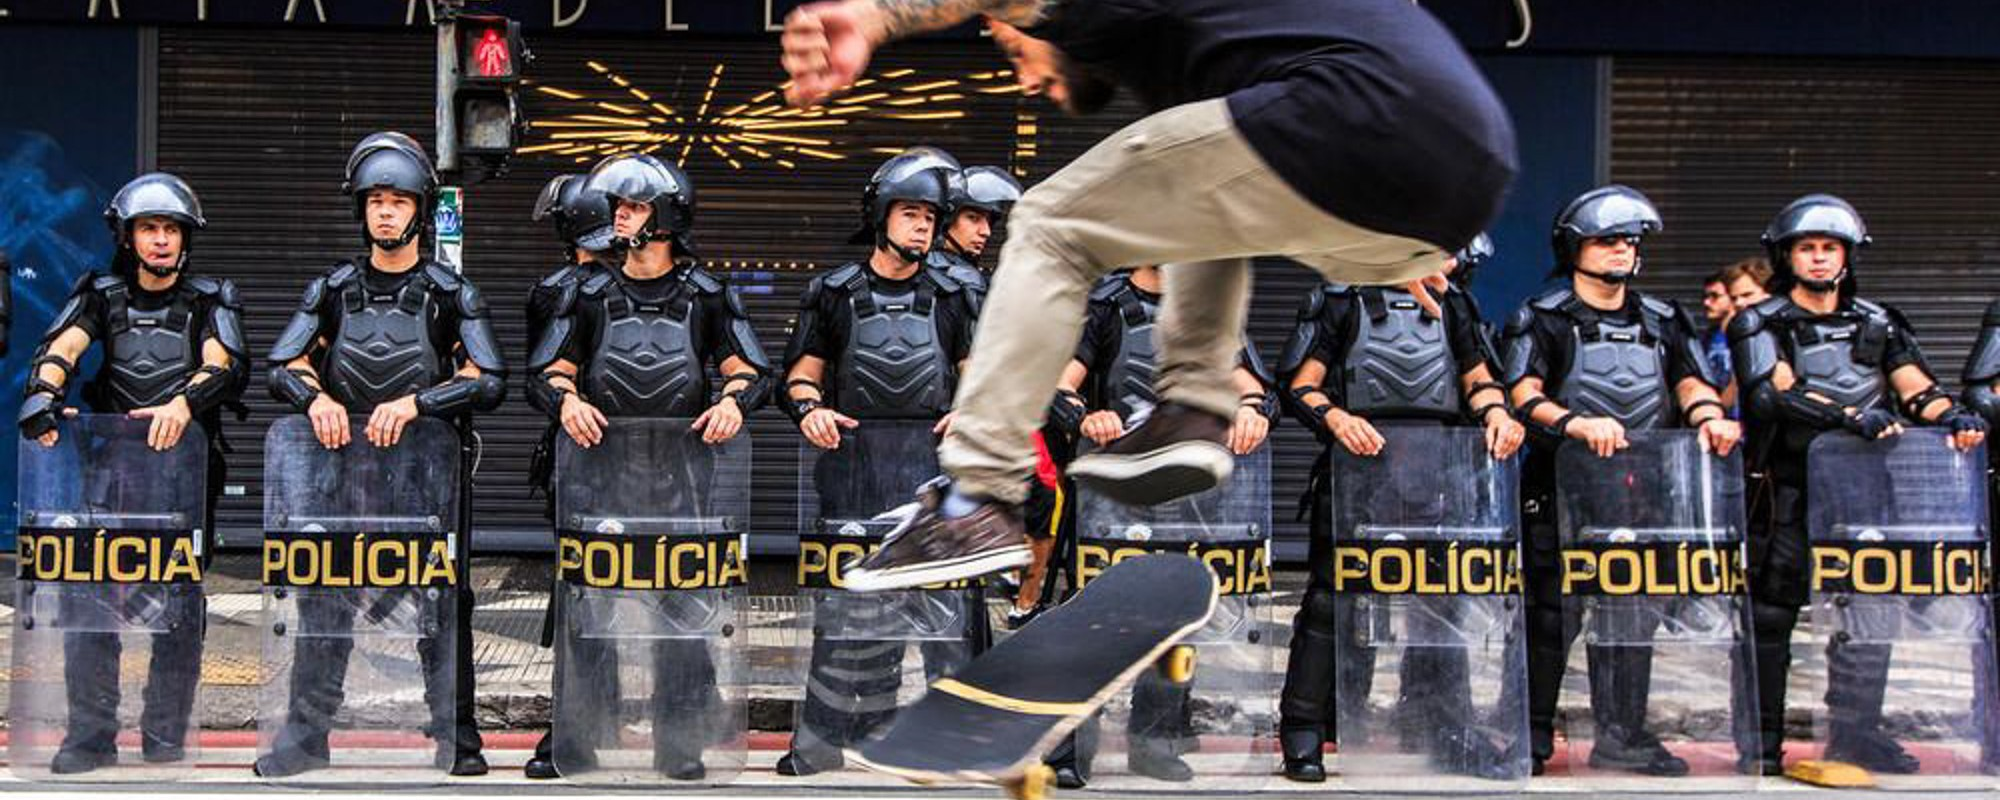 Flipando o sistema desde junho de 2013: fotos de skate nos protestos